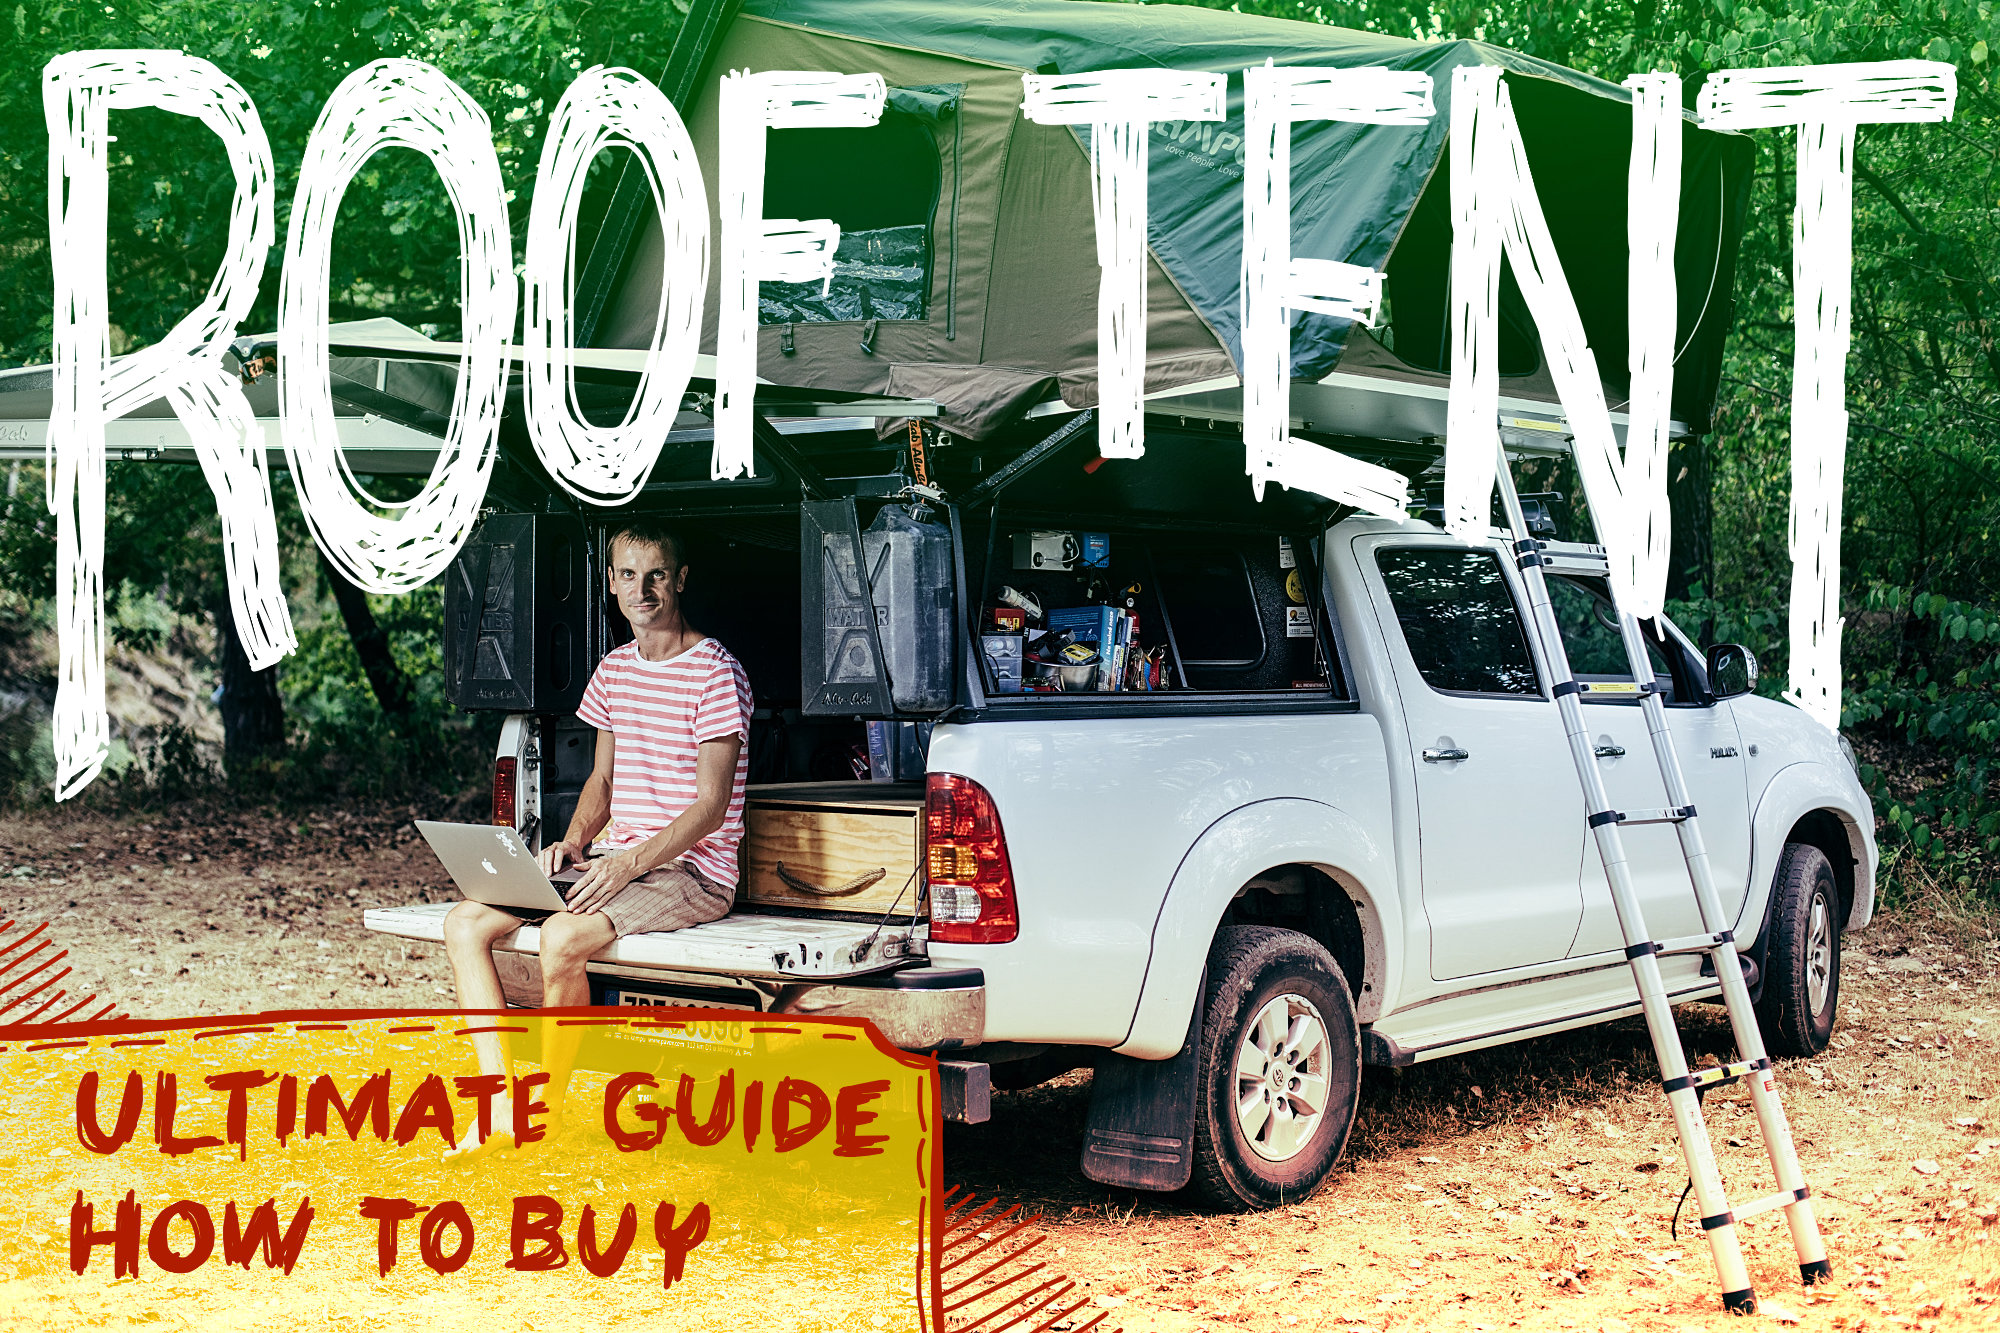 Adventure Kings Roof Top Tent Weight how to buy a roof top tent +tips | gurucamper